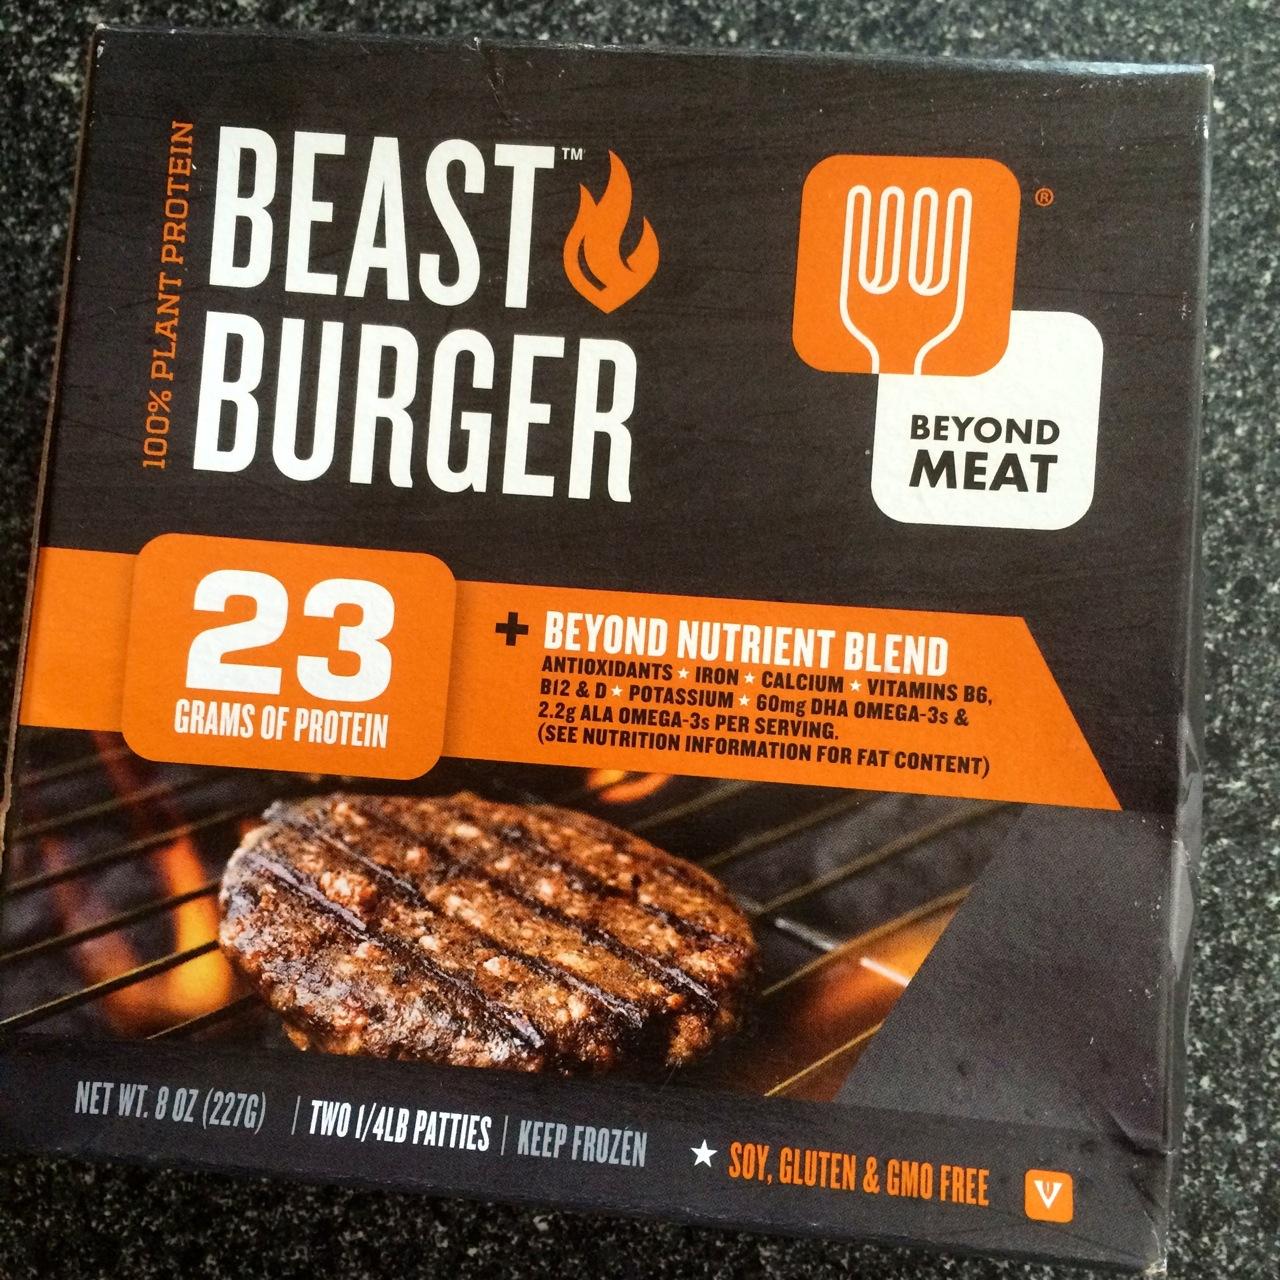 http://i1.wp.com/fatgayvegan.com/wp-content/uploads/2015/06/beast-burger-beyond-meat.jpg?fit=1280%2C1280